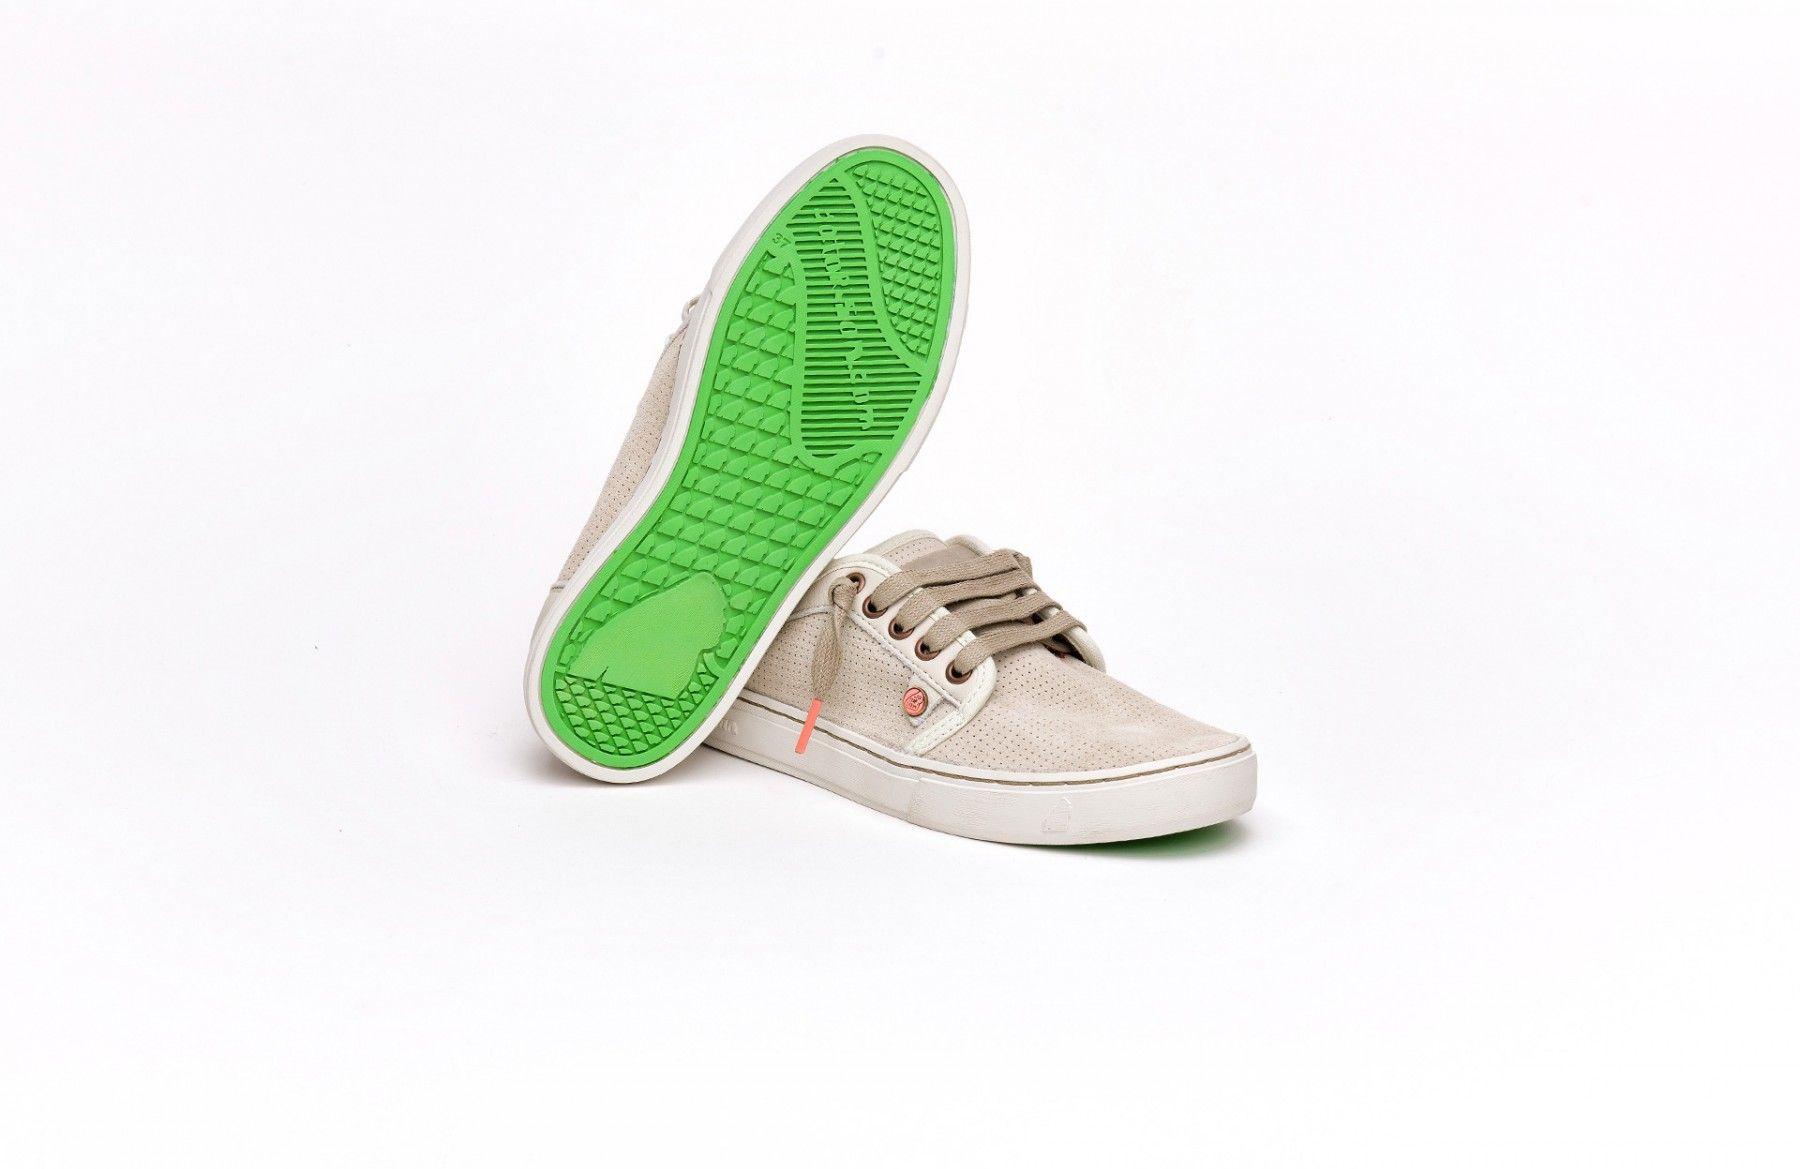 Suedepunch Mega Marbre - Satorisan Shoes